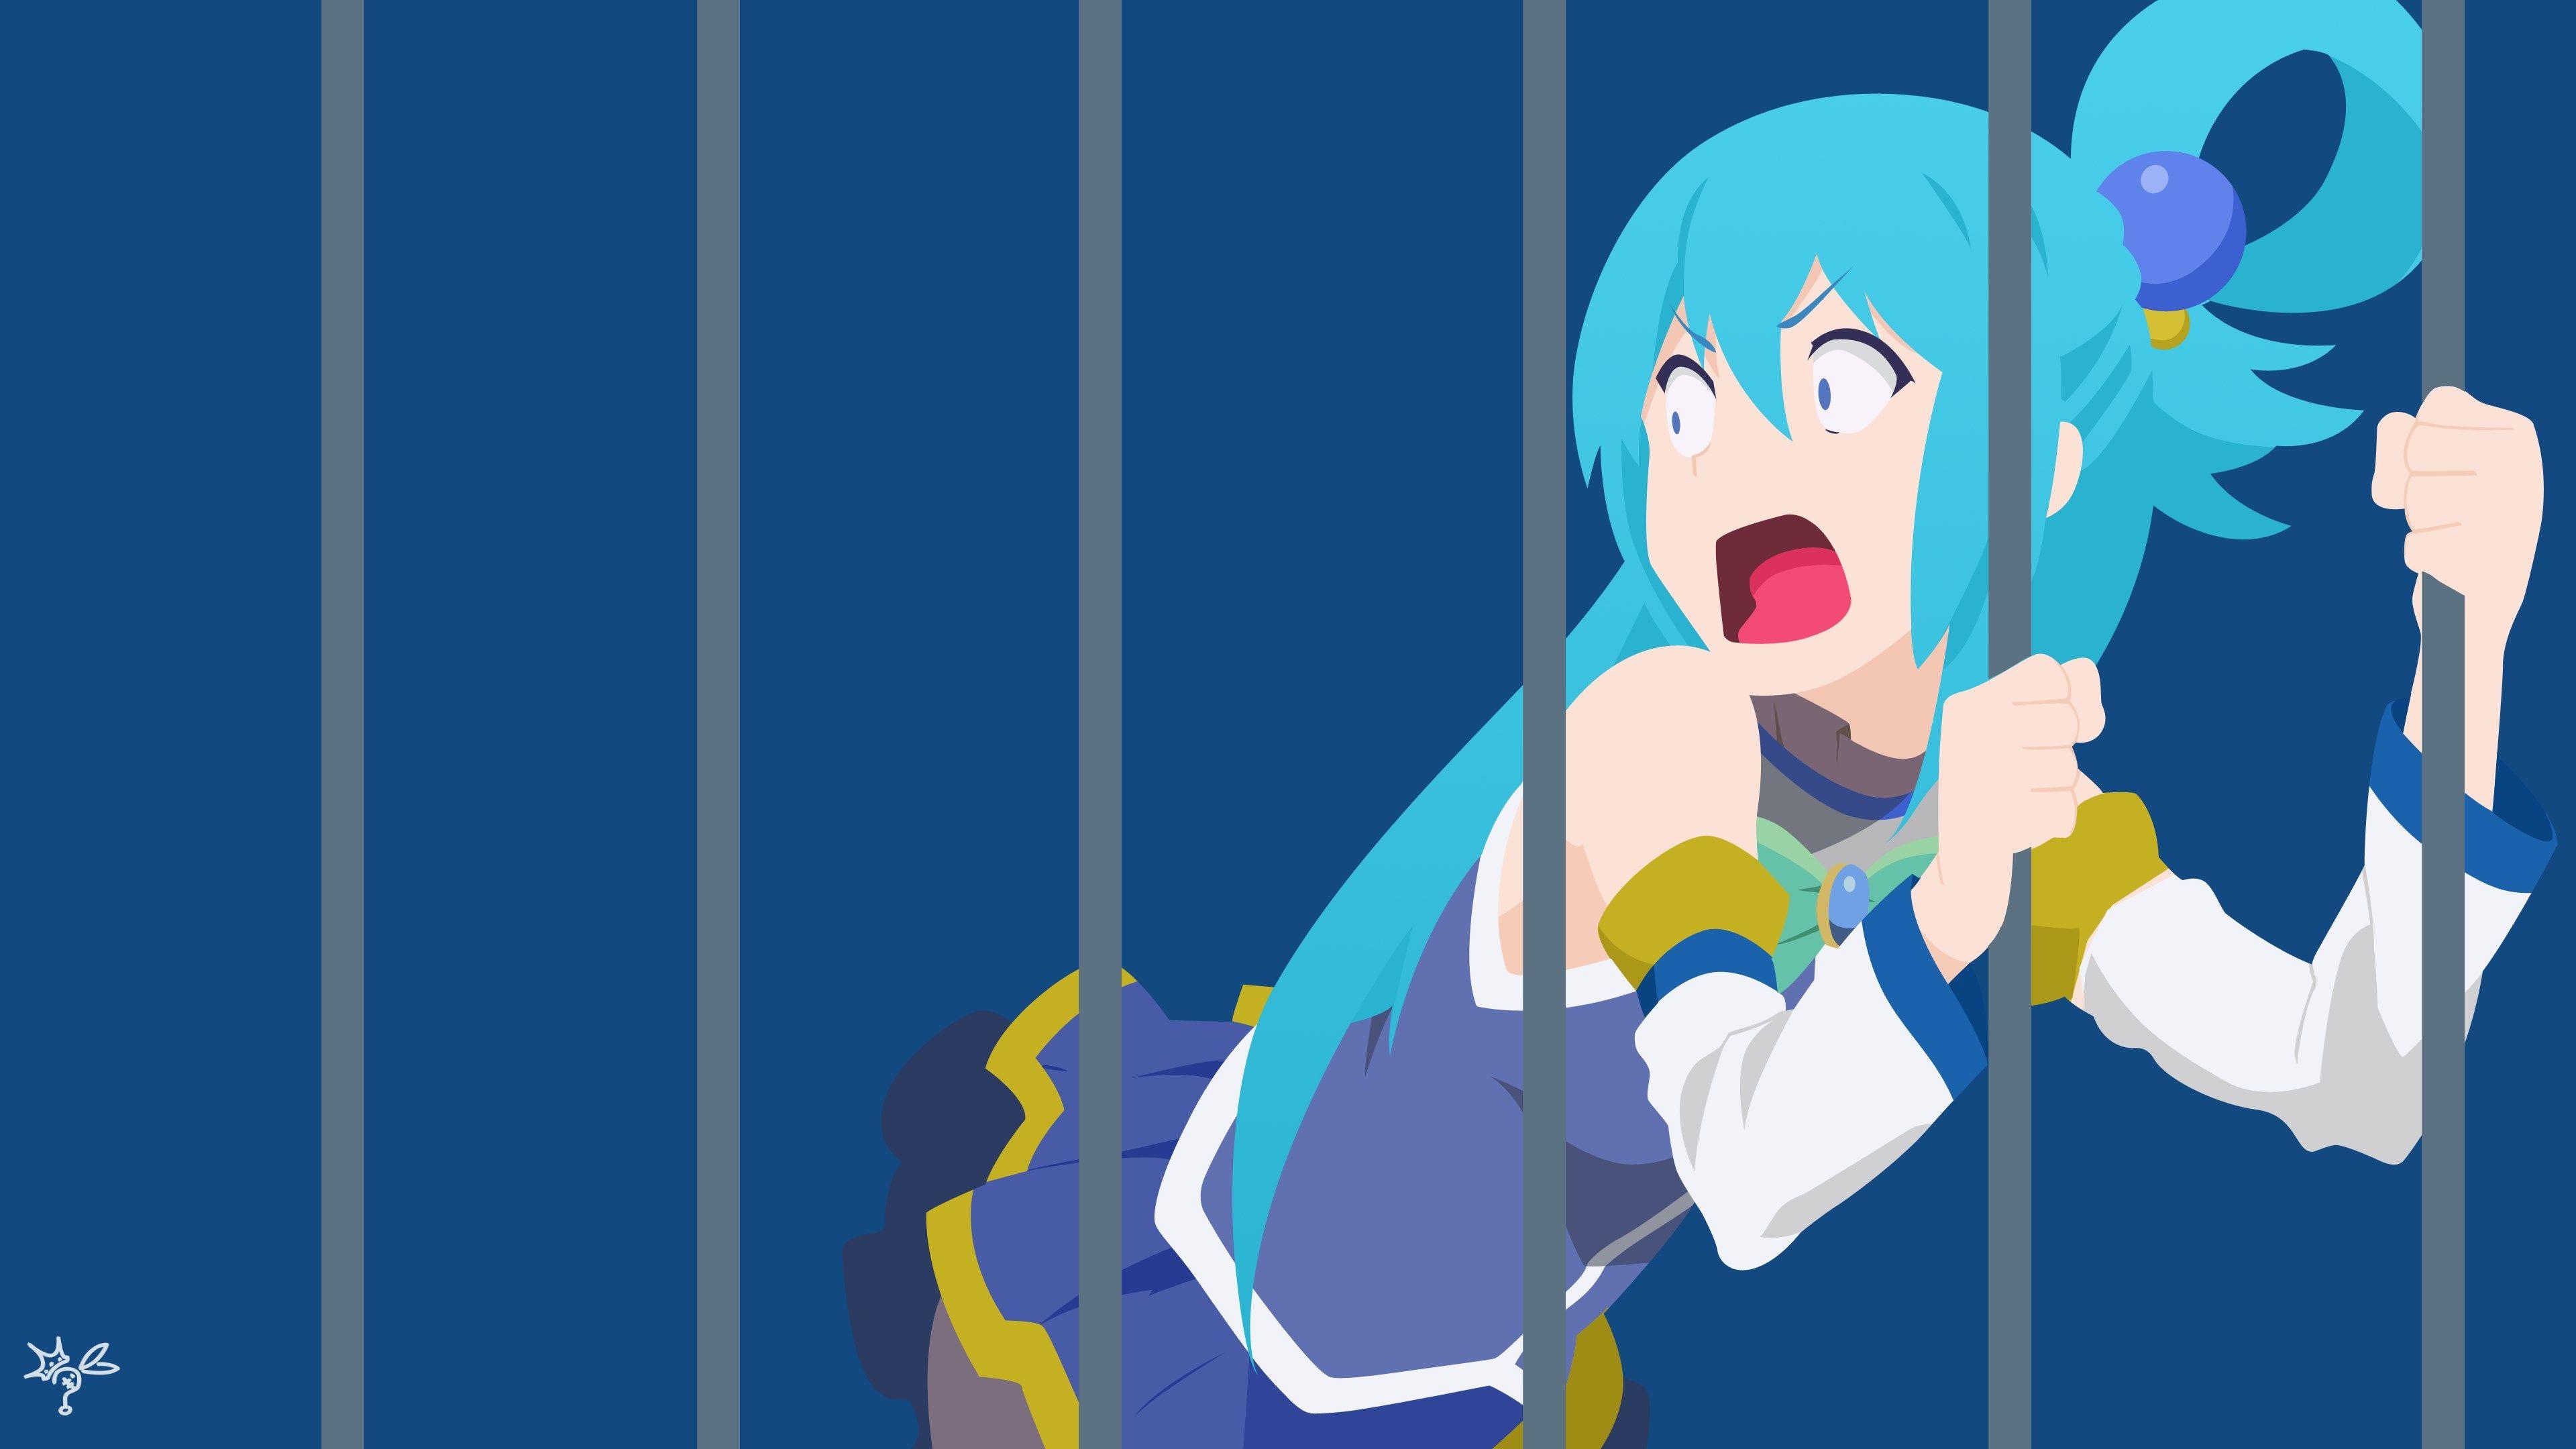 Edyta Turner Free Pictures Konosuba Gods Blessing On This Wonderful World 3840x2160 Px Anime Wallpaper Hd Anime Wallpapers Anime